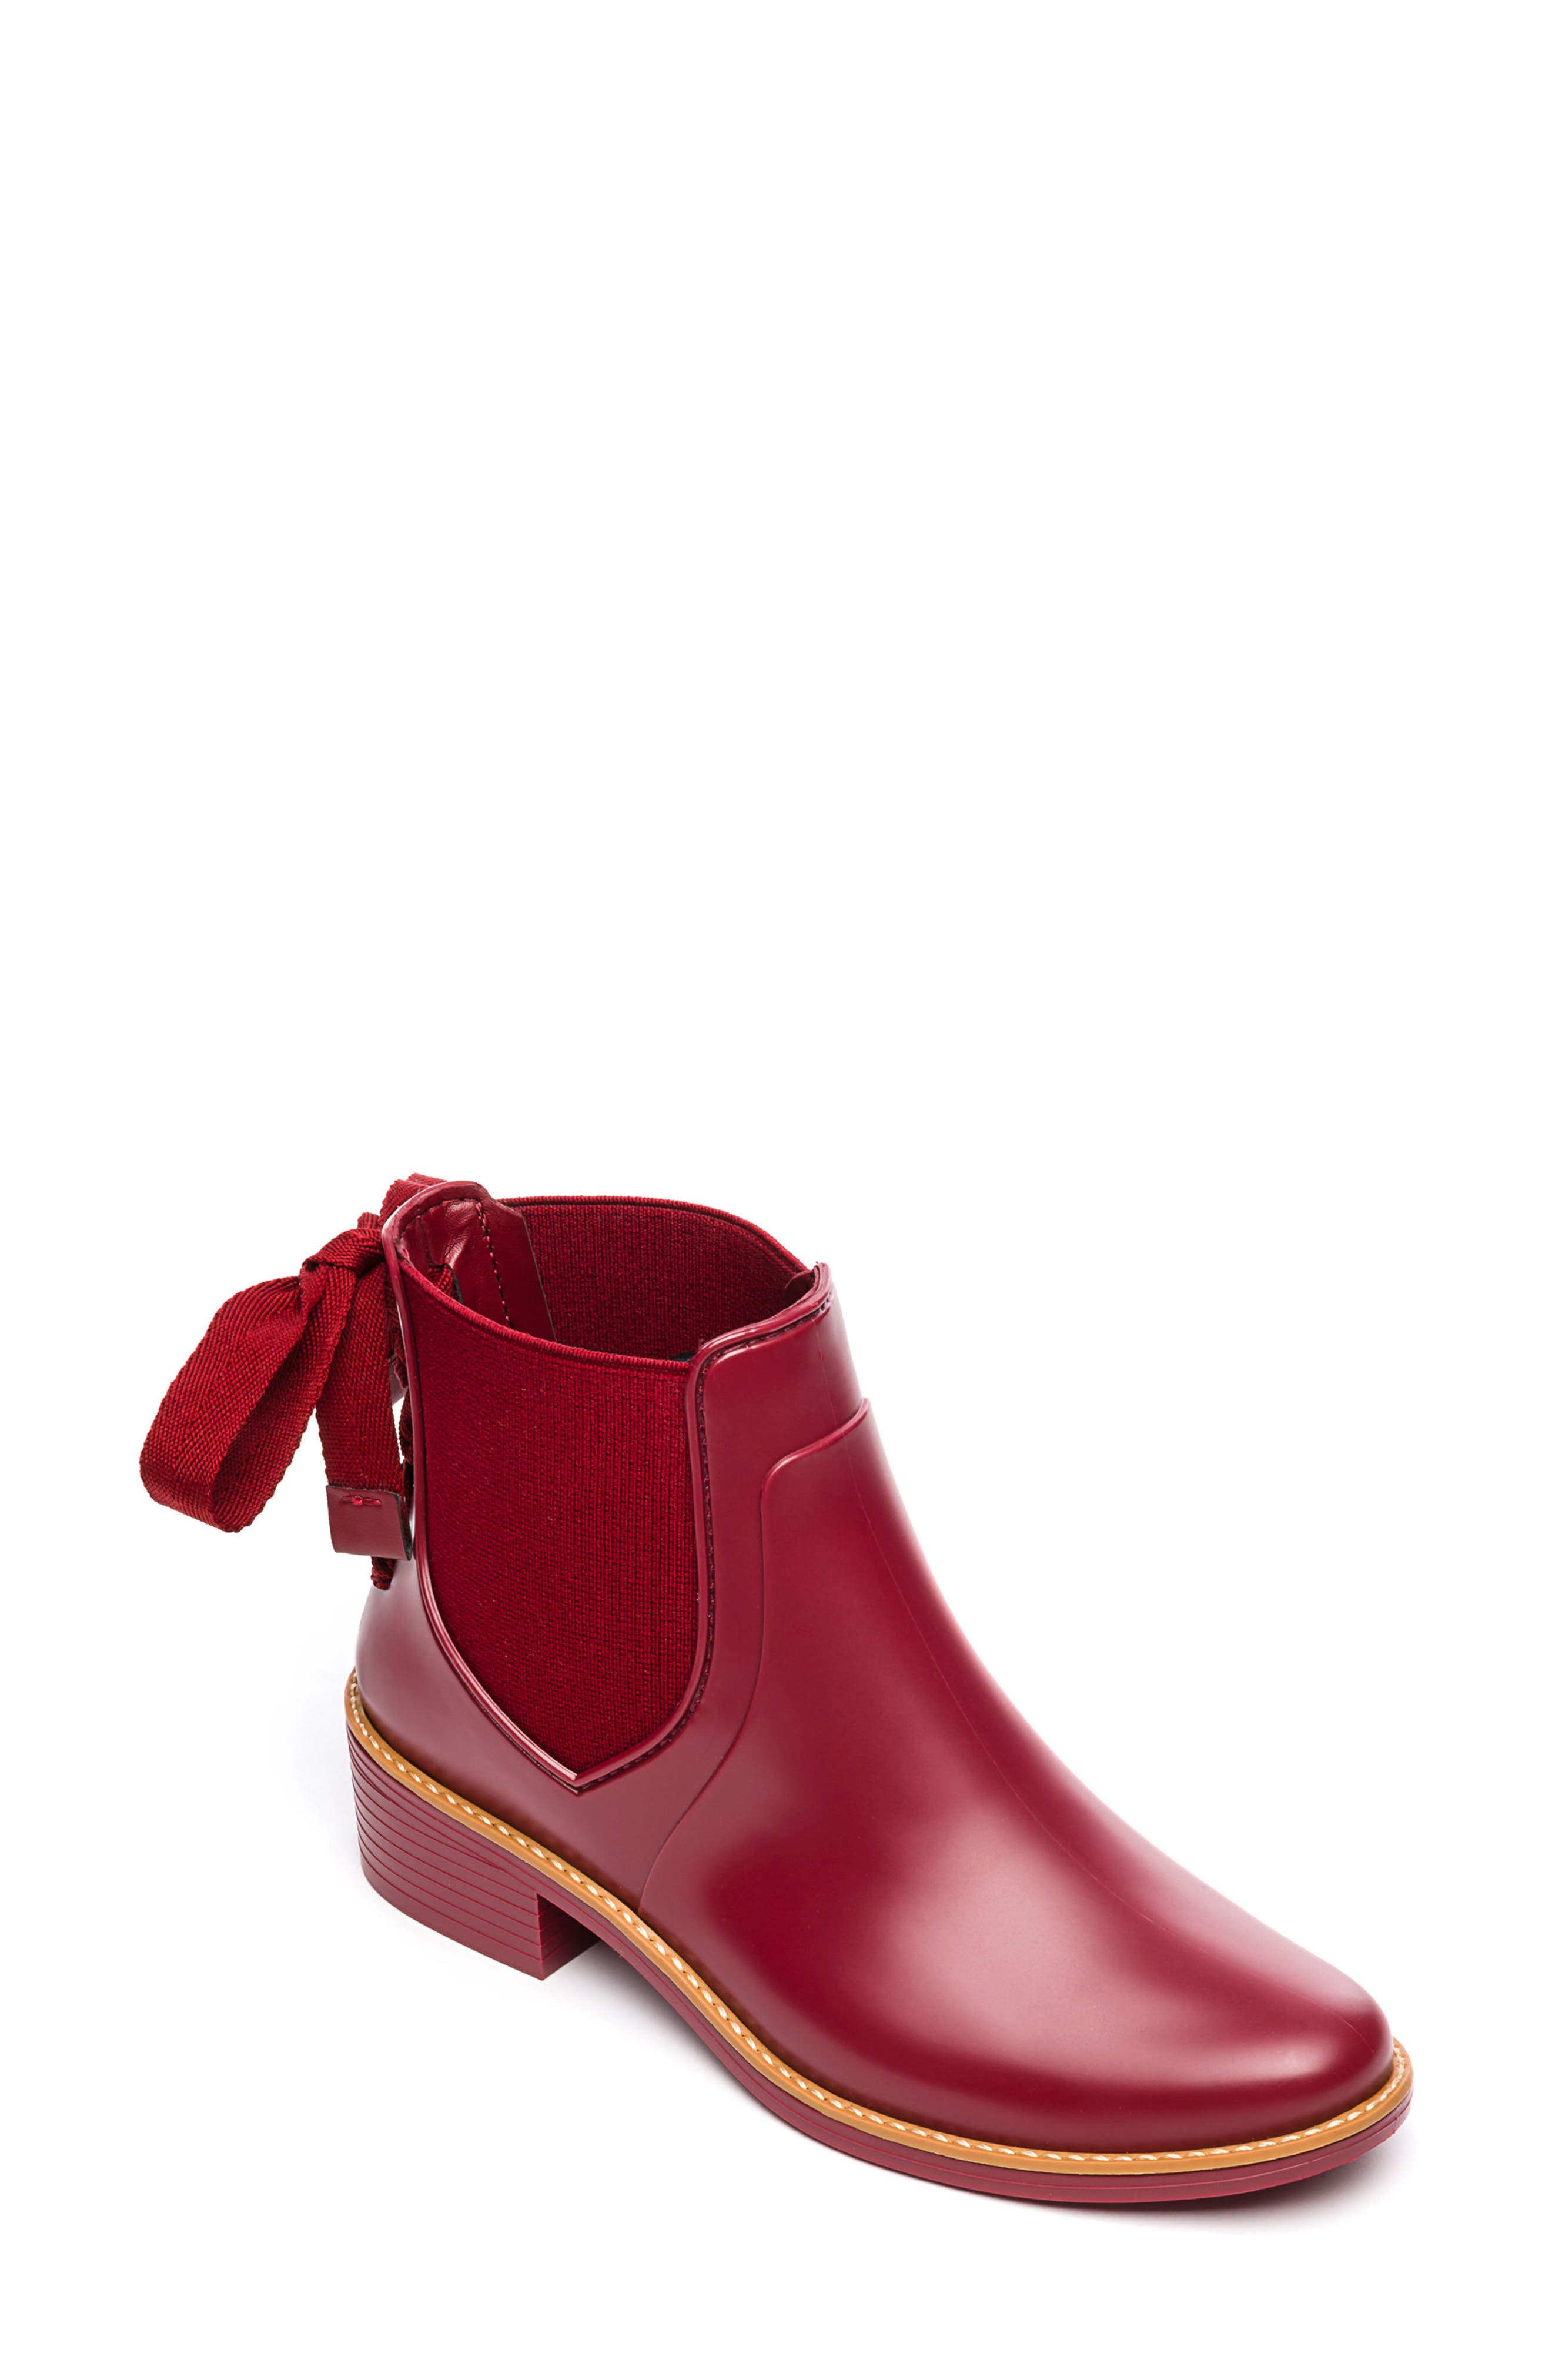 Paxton Rain Boot,                         Main,                         color, 930